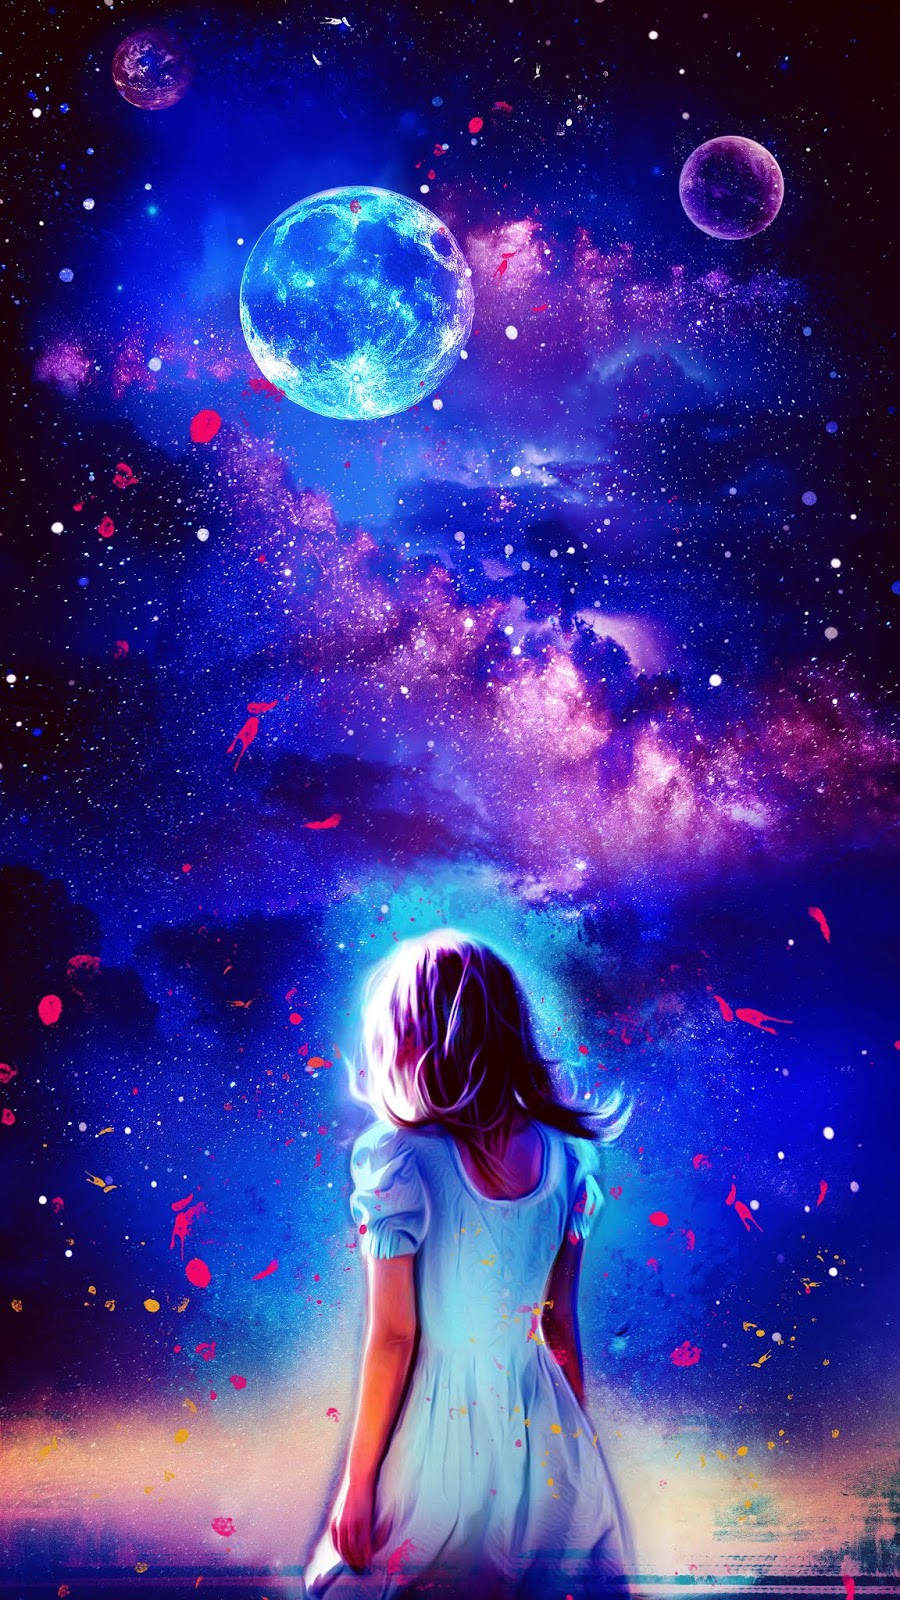 Vivid starry night